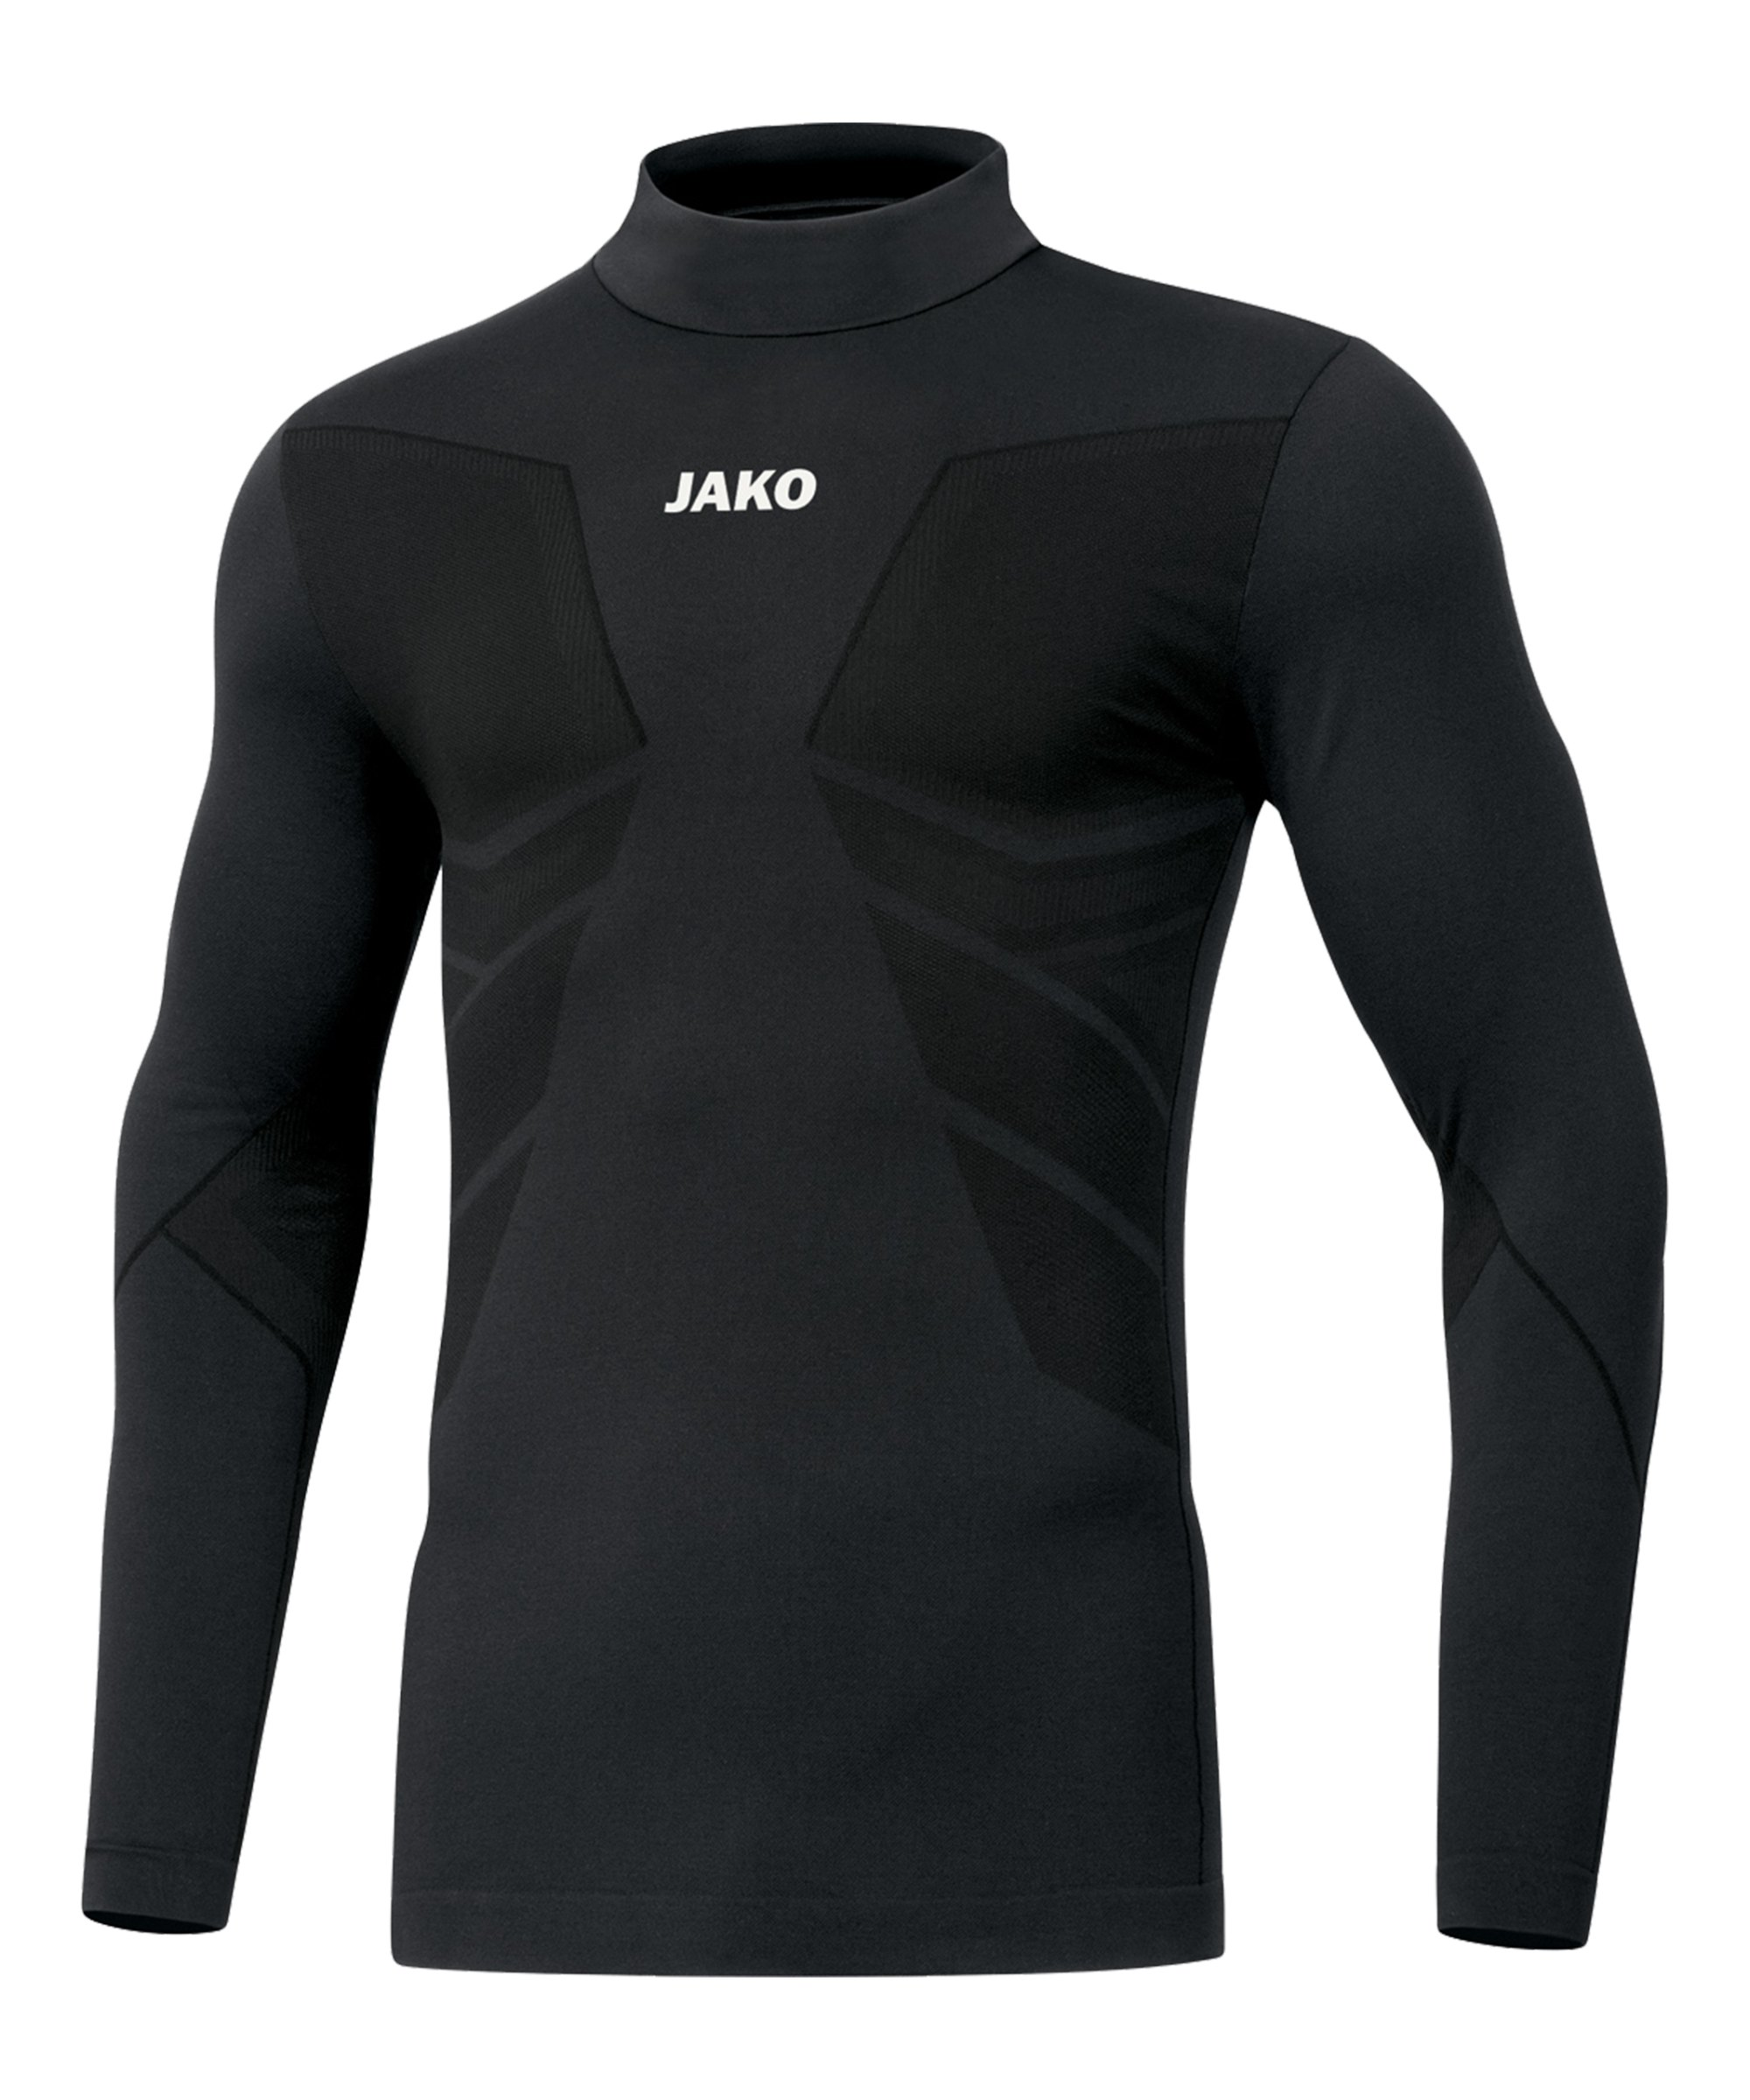 JAKO Comfort 2.0 Turtleneck Kids Schwarz F08 - schwarz